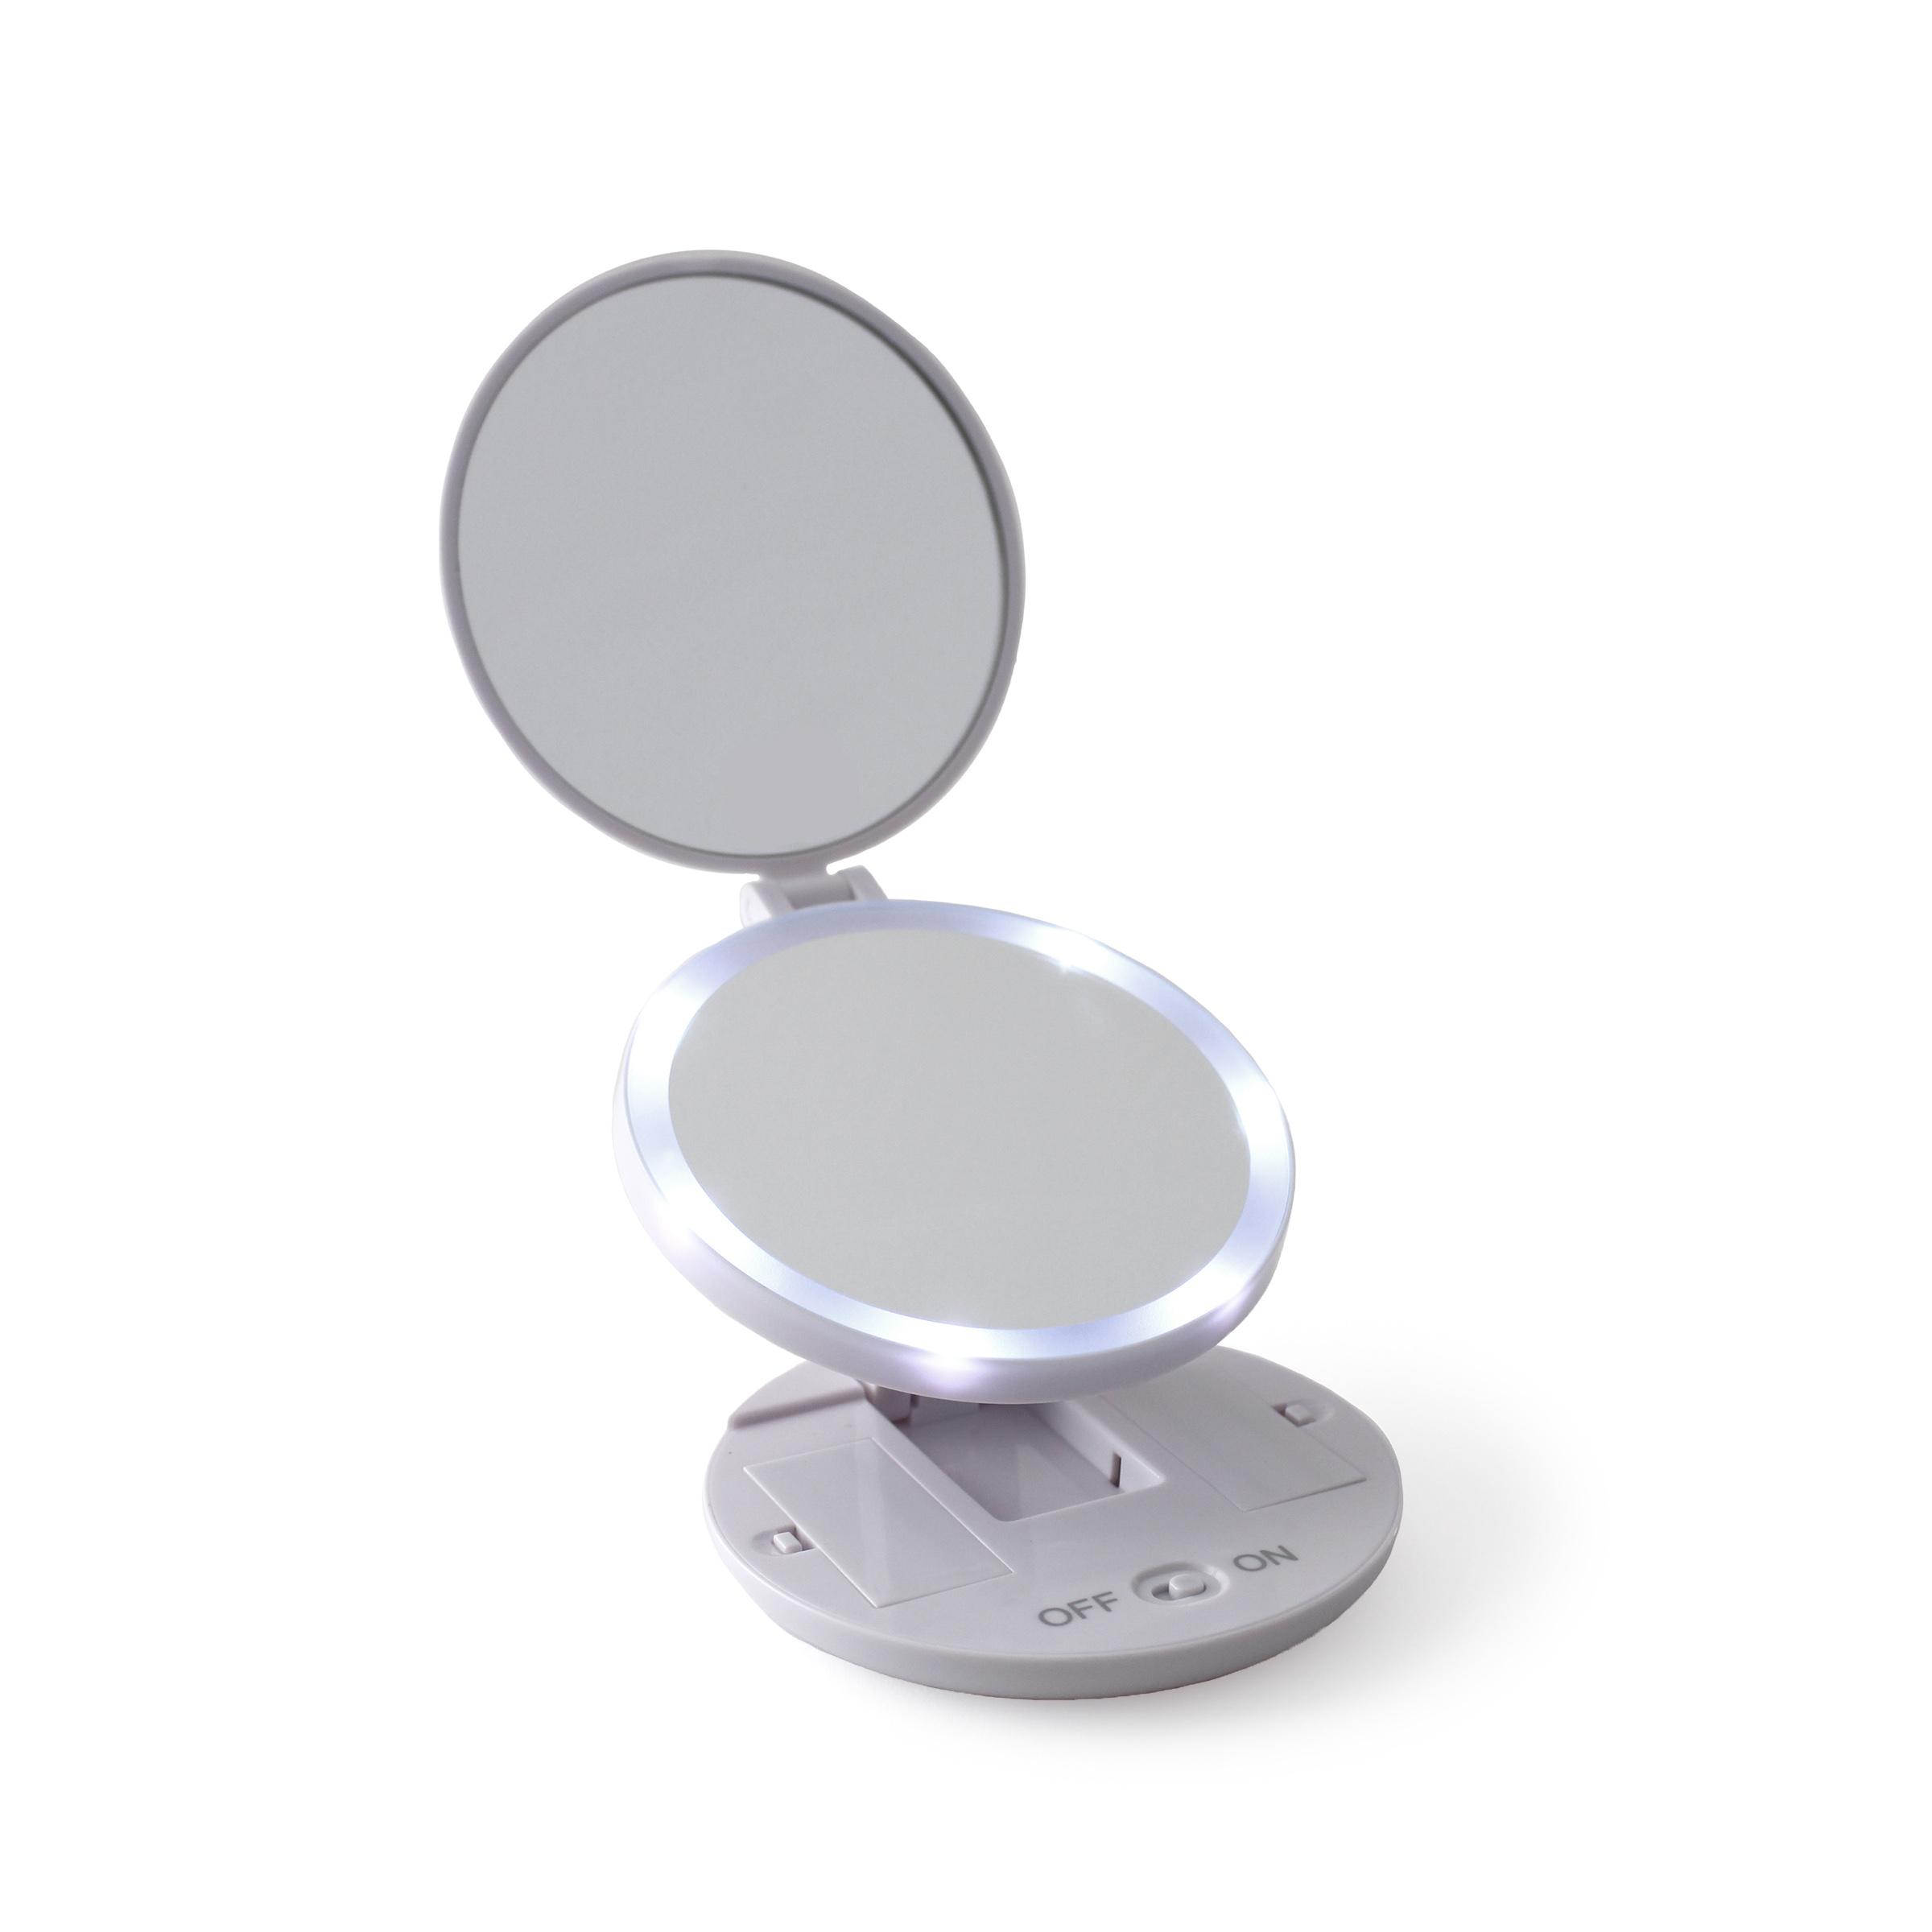 Iona Compact LED Mirror